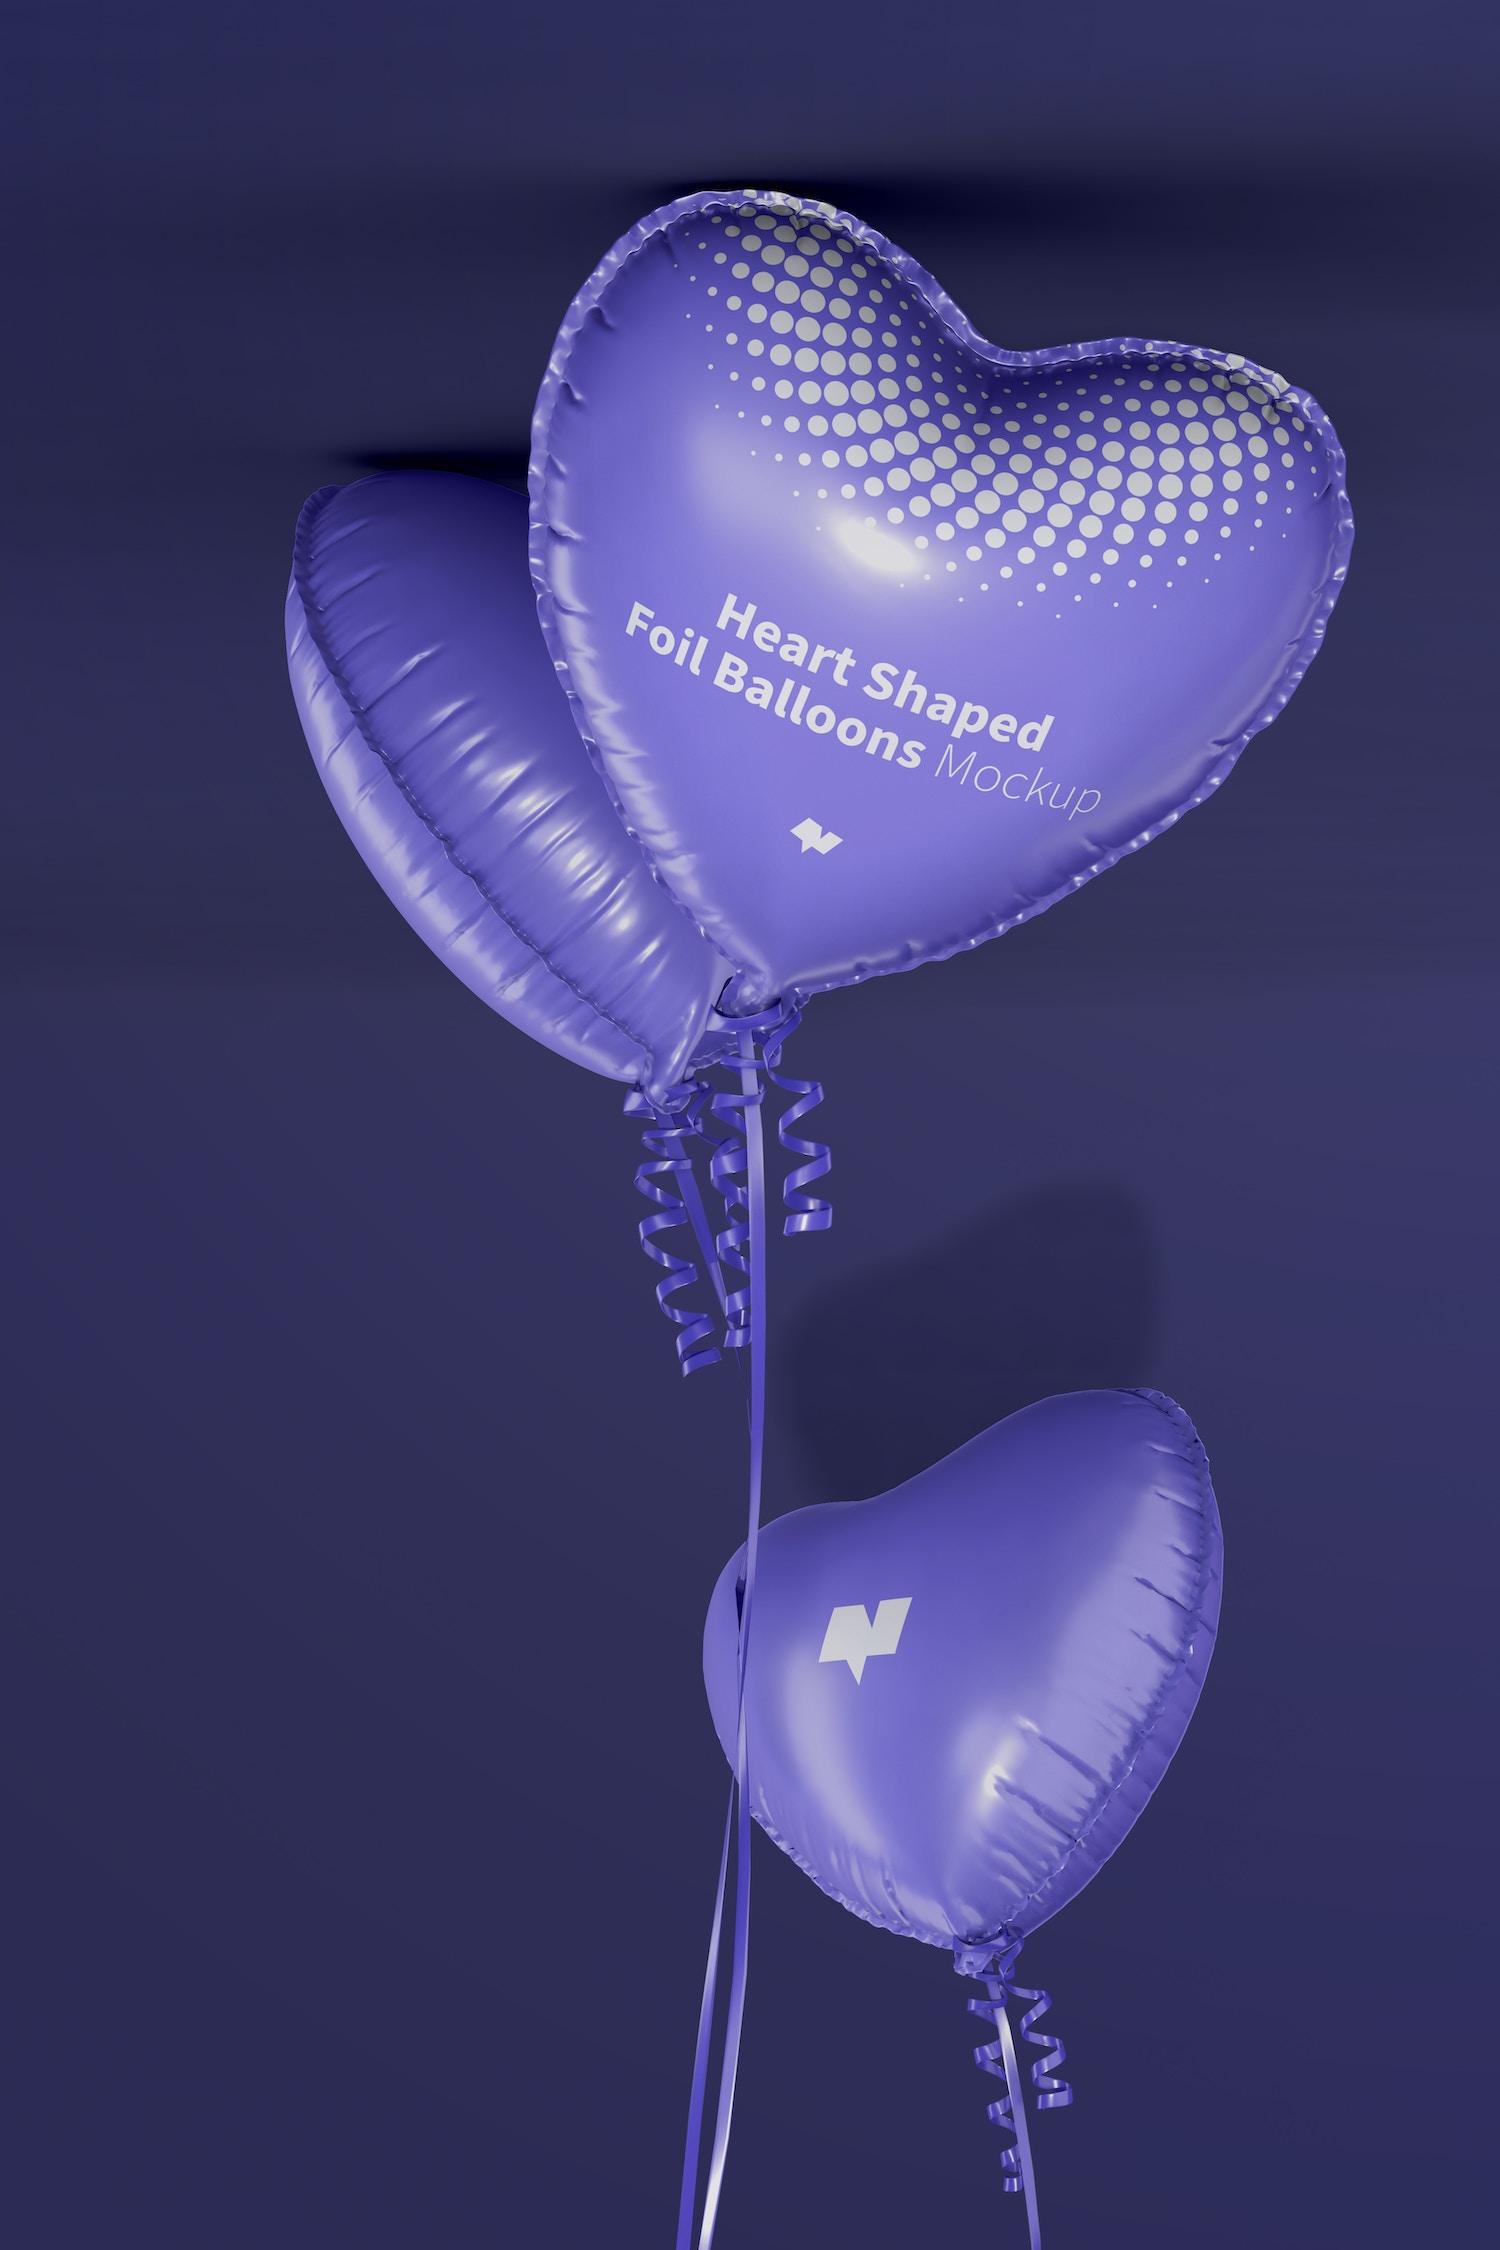 Heart Shaped Foil Balloons Mockup, Floating